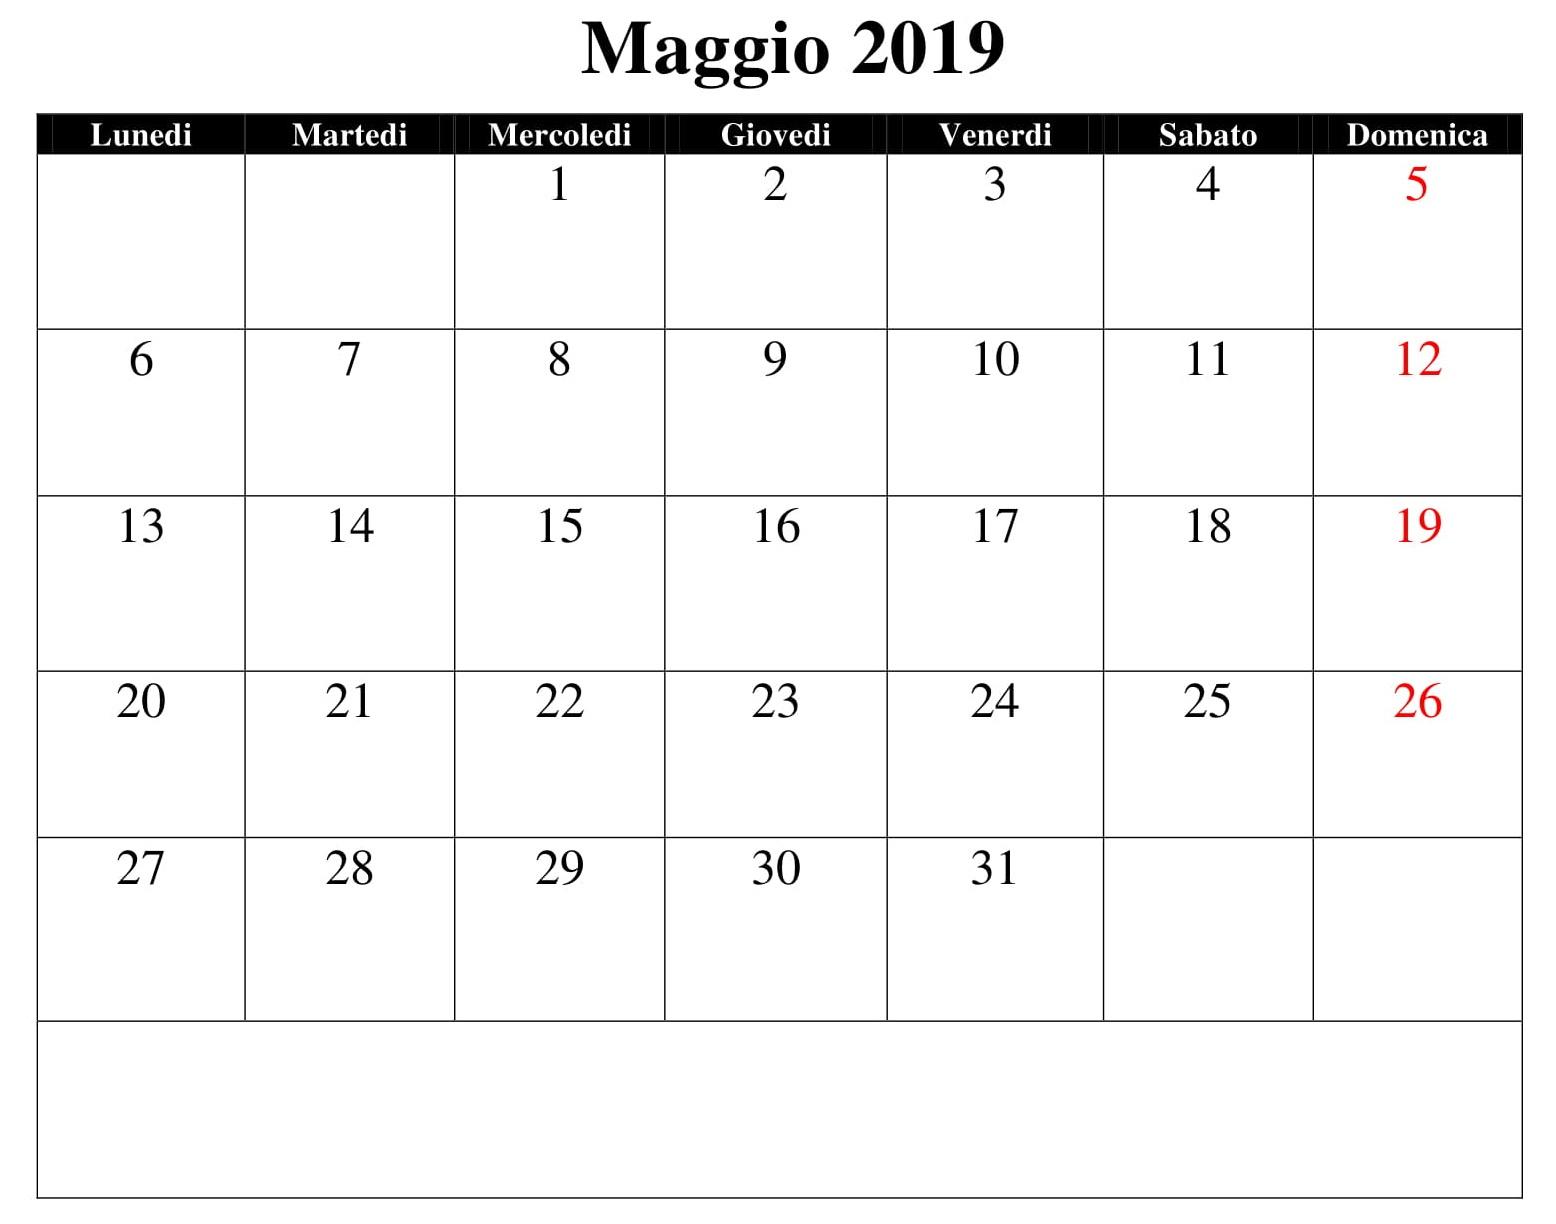 Calendario Maggio 2019 Word